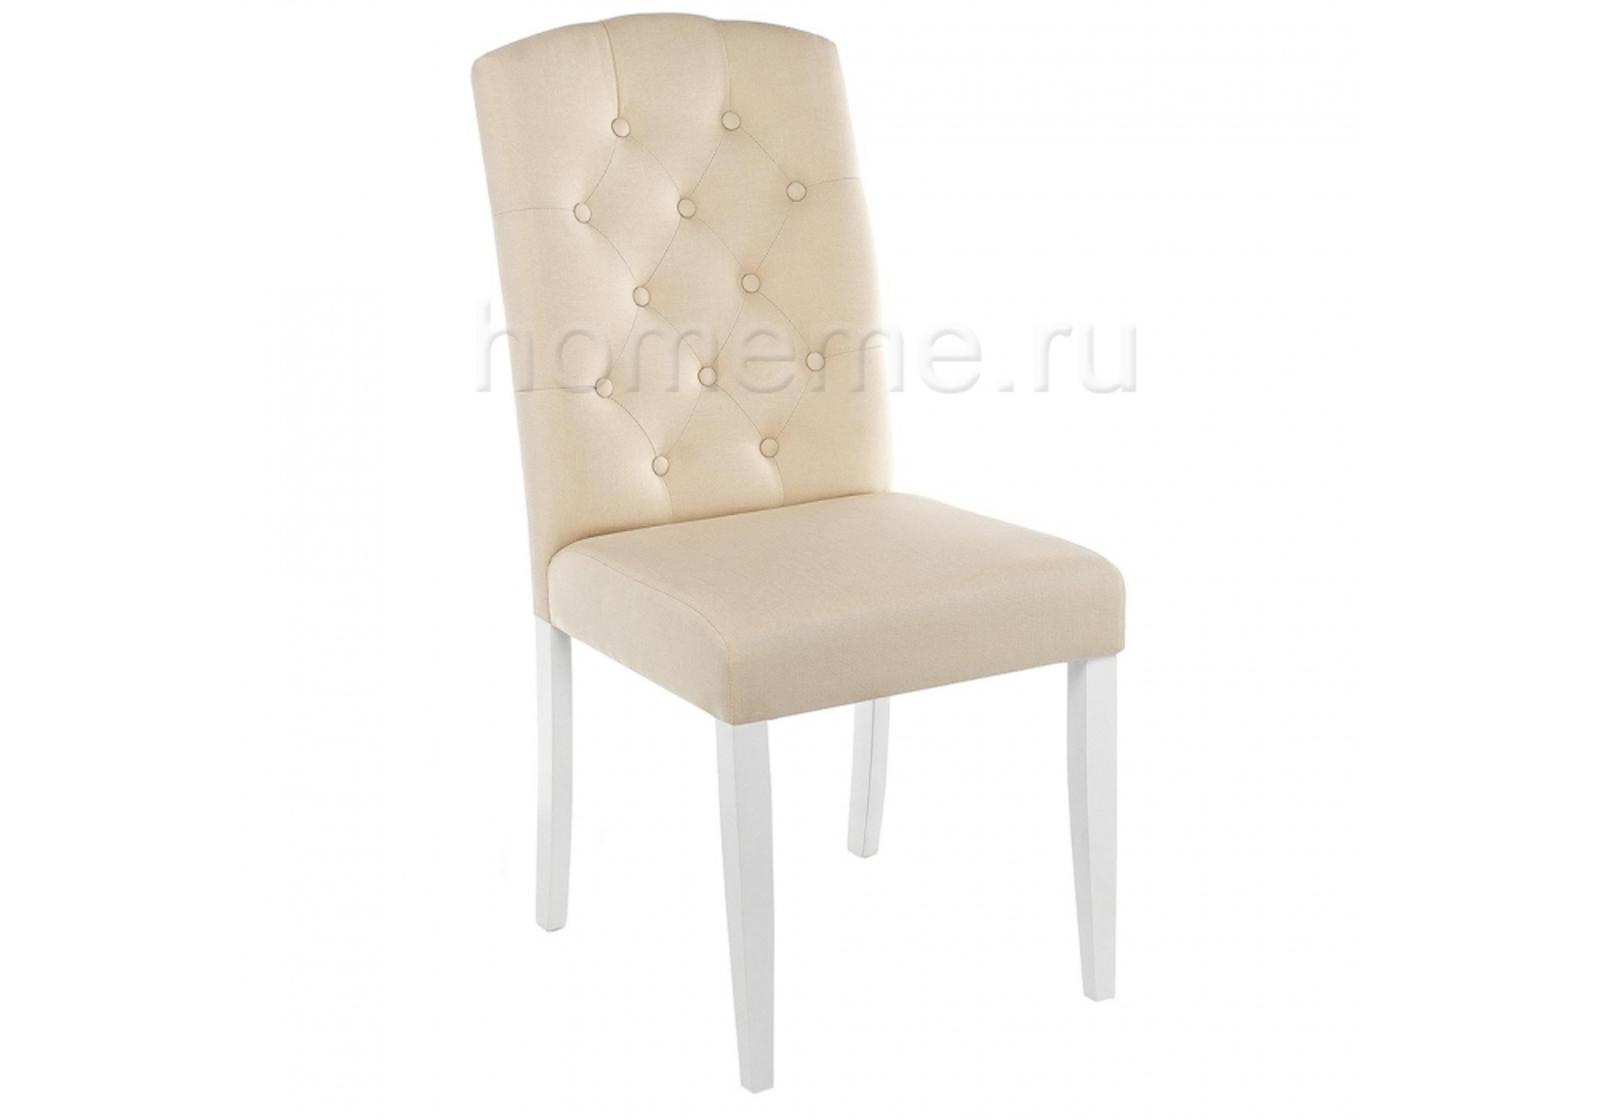 Стул HomeMe Menson white / fabric сream 11024 от Homeme.ru